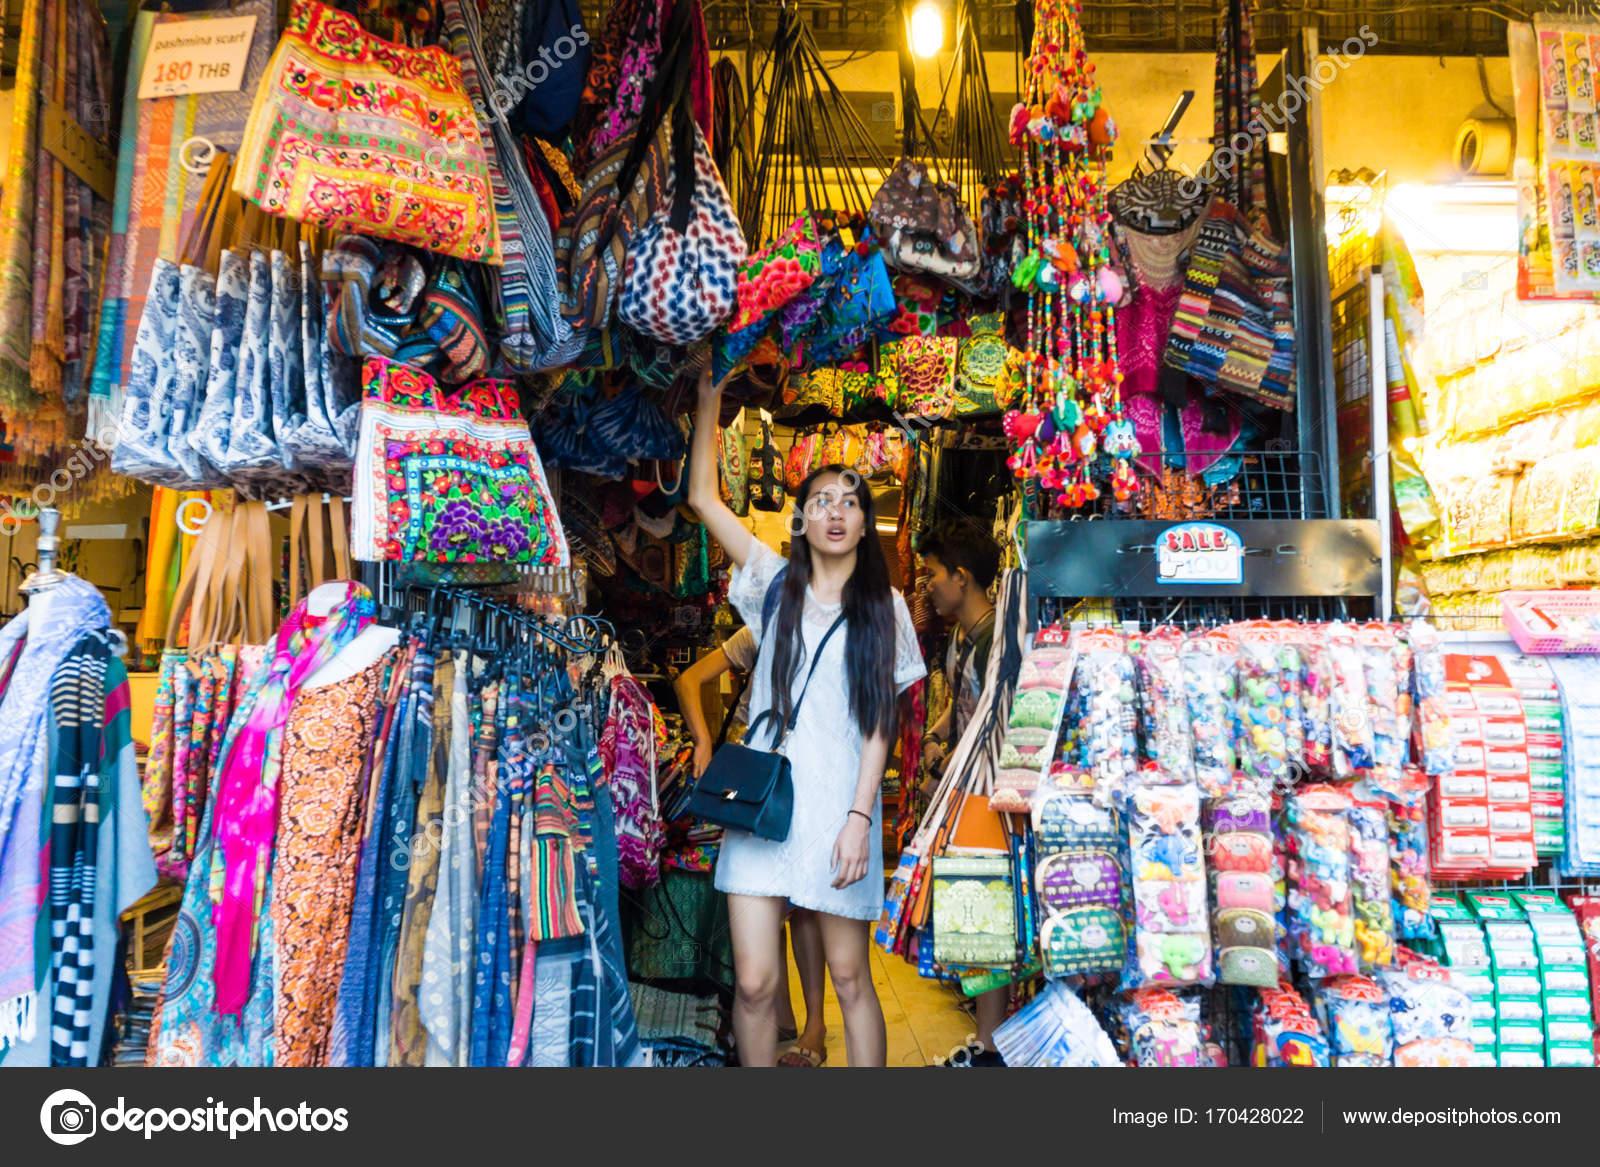 Bangkok Thailand Feb 2017 Foreign Tourist Buys Some Thai Handicraft